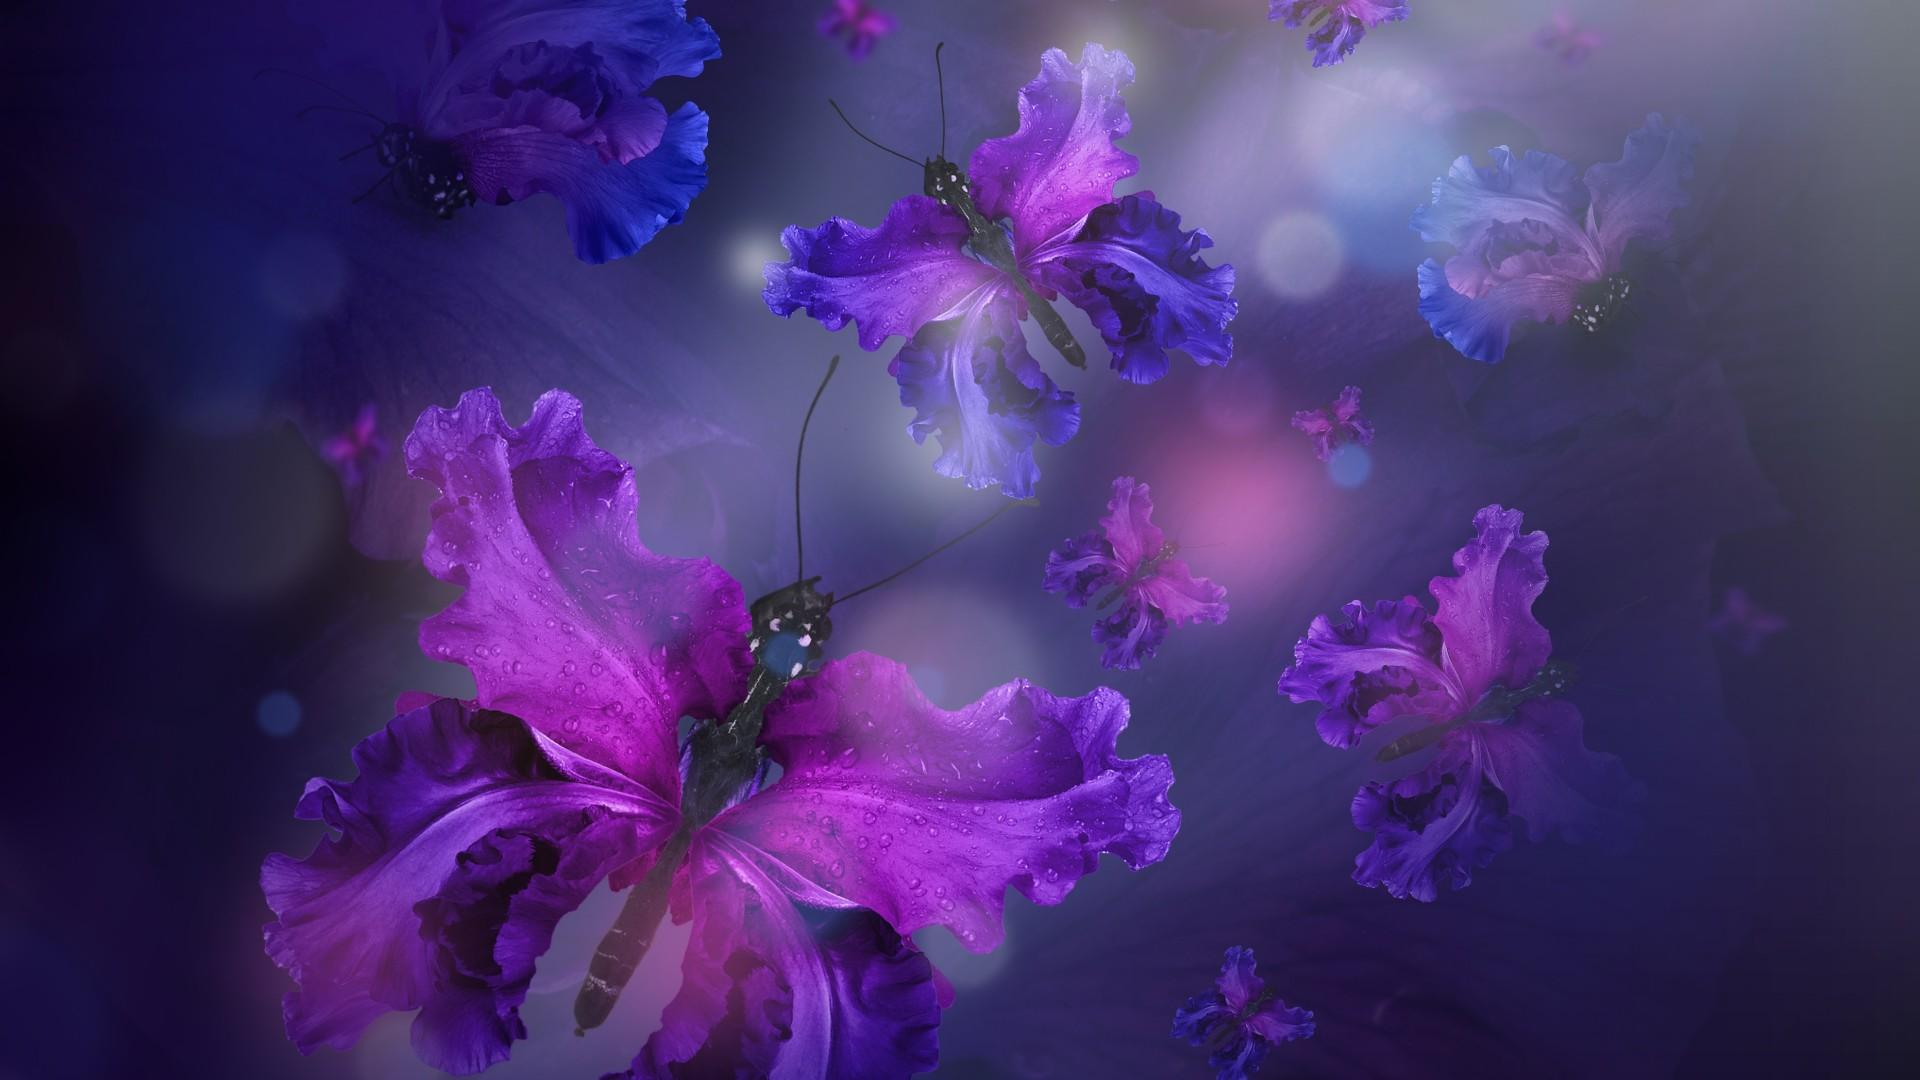 Purple iris butterfly abstract fantasy art wallpaper